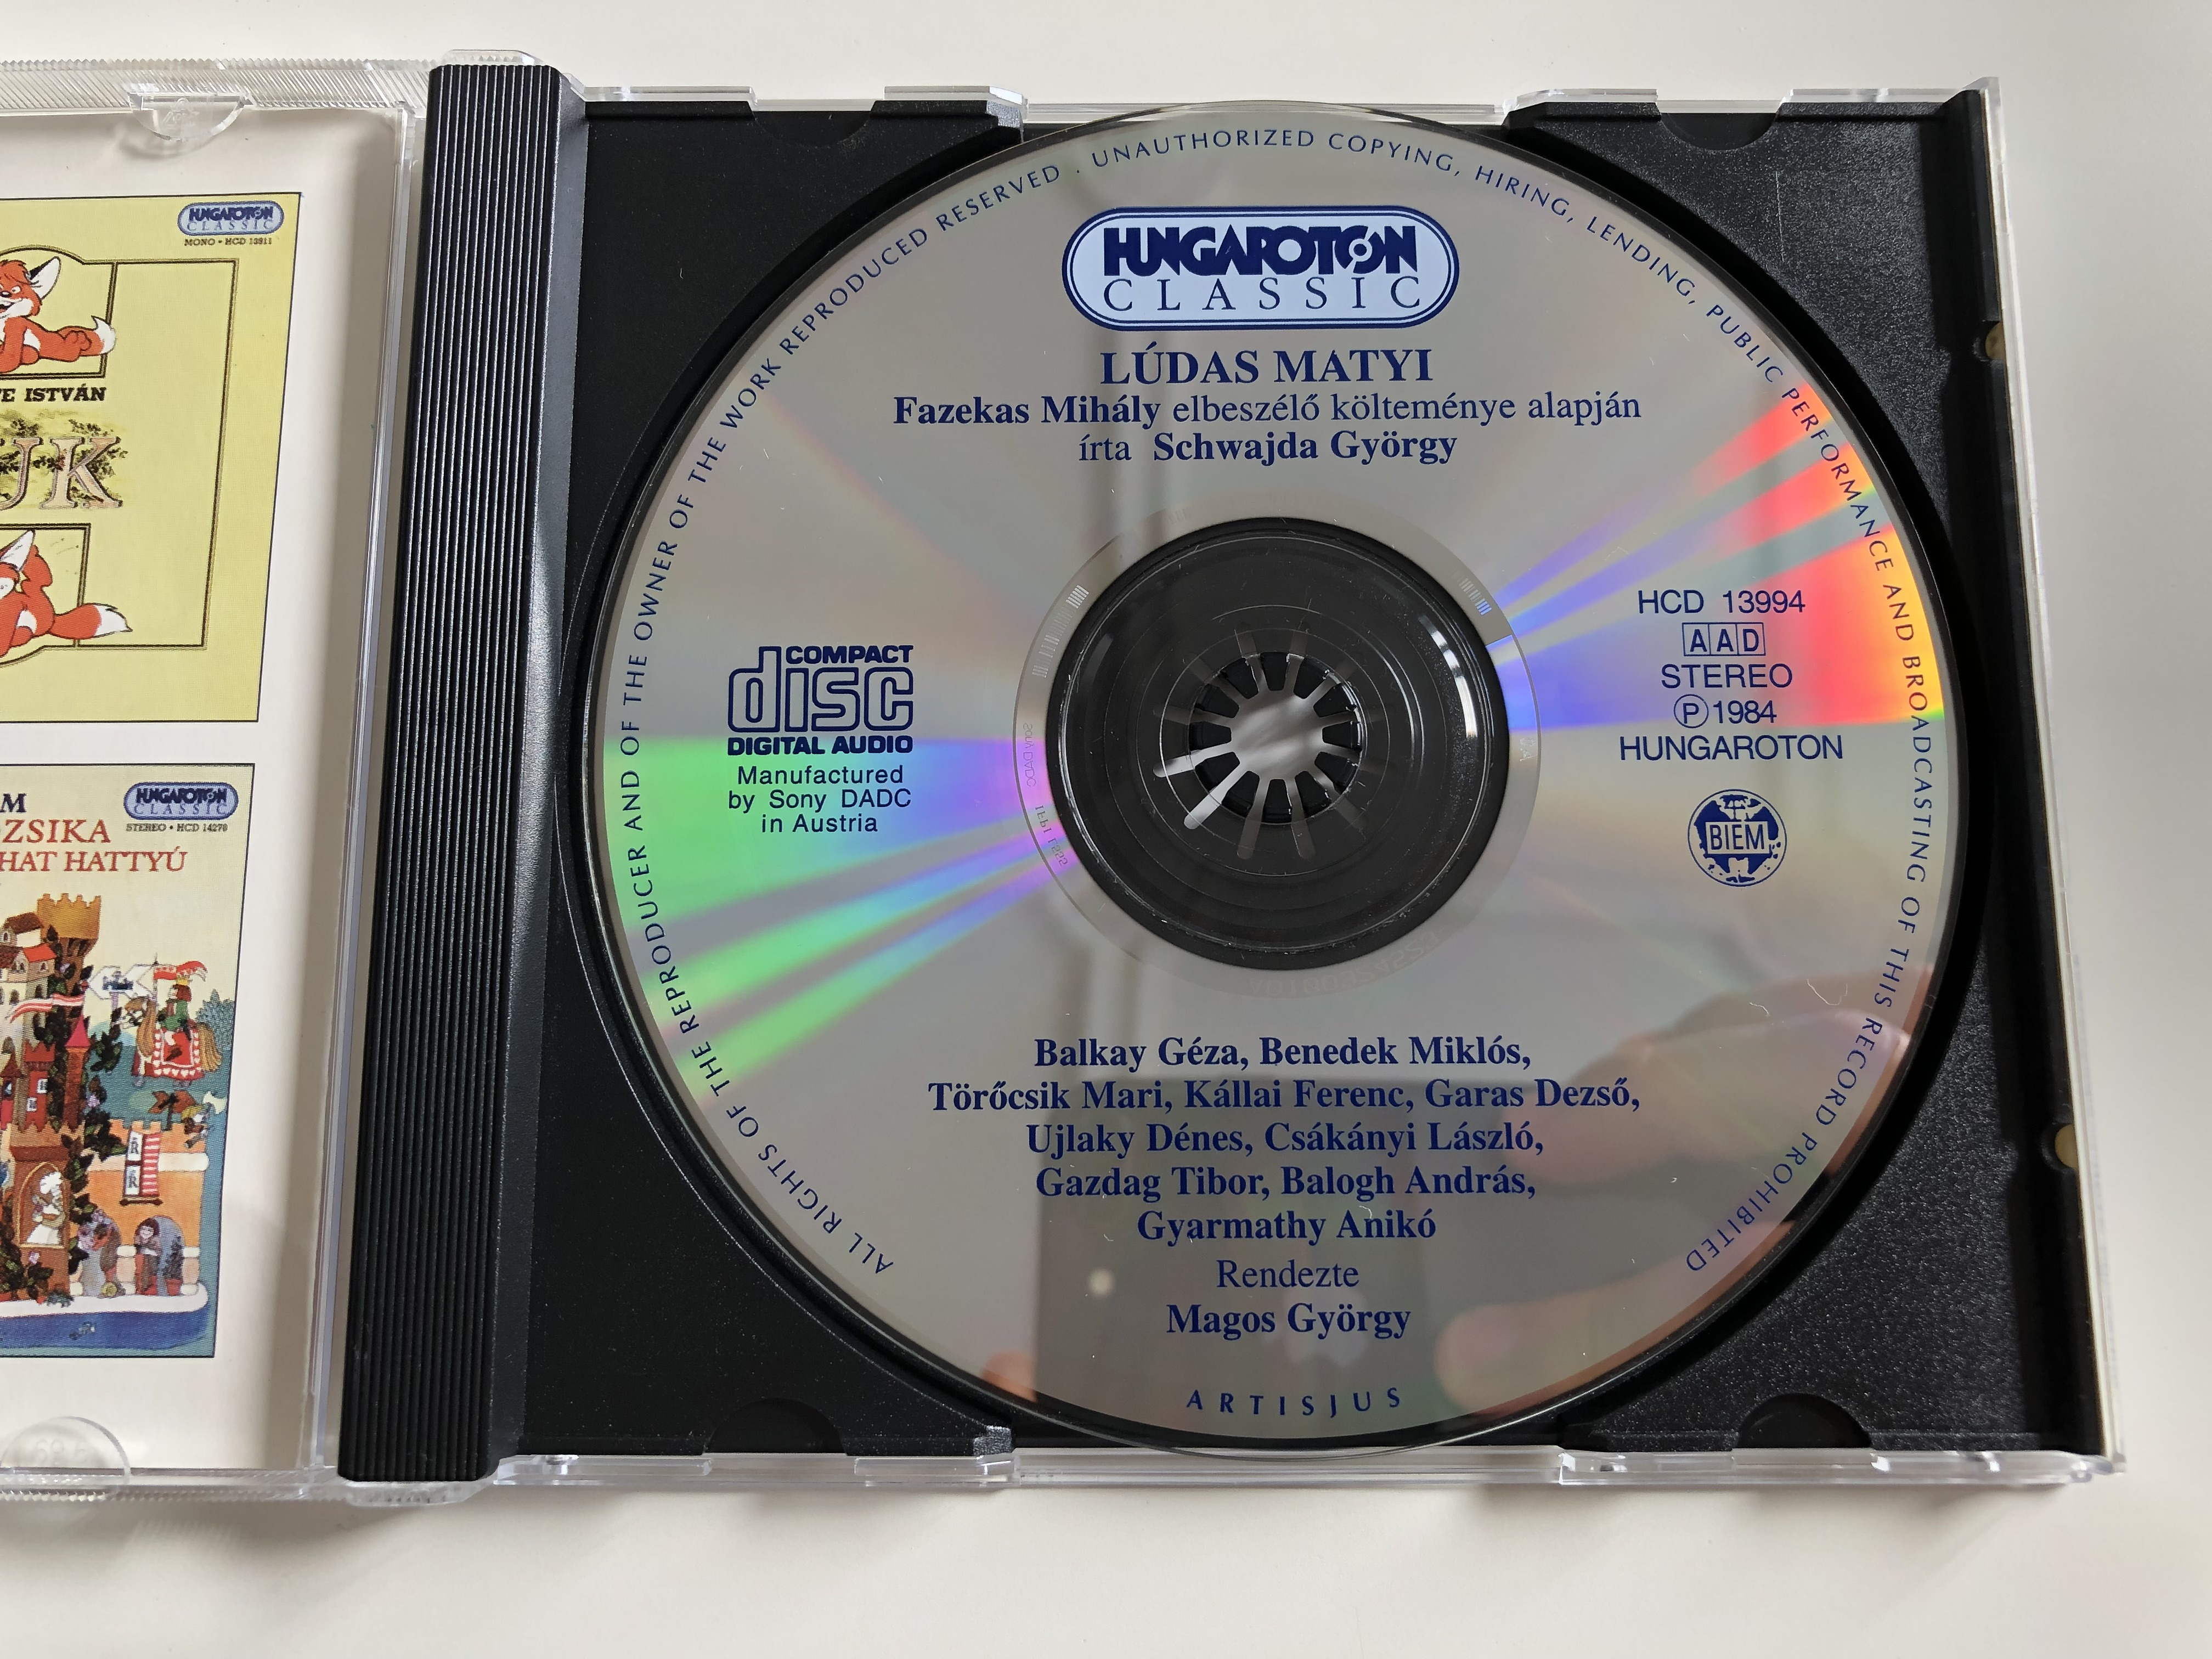 ludas-matyi-schwajda-gy-rgy-mesej-t-ka-hungarian-children-s-radioplay-written-by-mih-ly-fazekas-adapted-by-schwajda-gy-rgy-directed-by-magos-gy-rgy-hcd-13994-hungaroton-classic-audio-cd-2000-3-.jpg